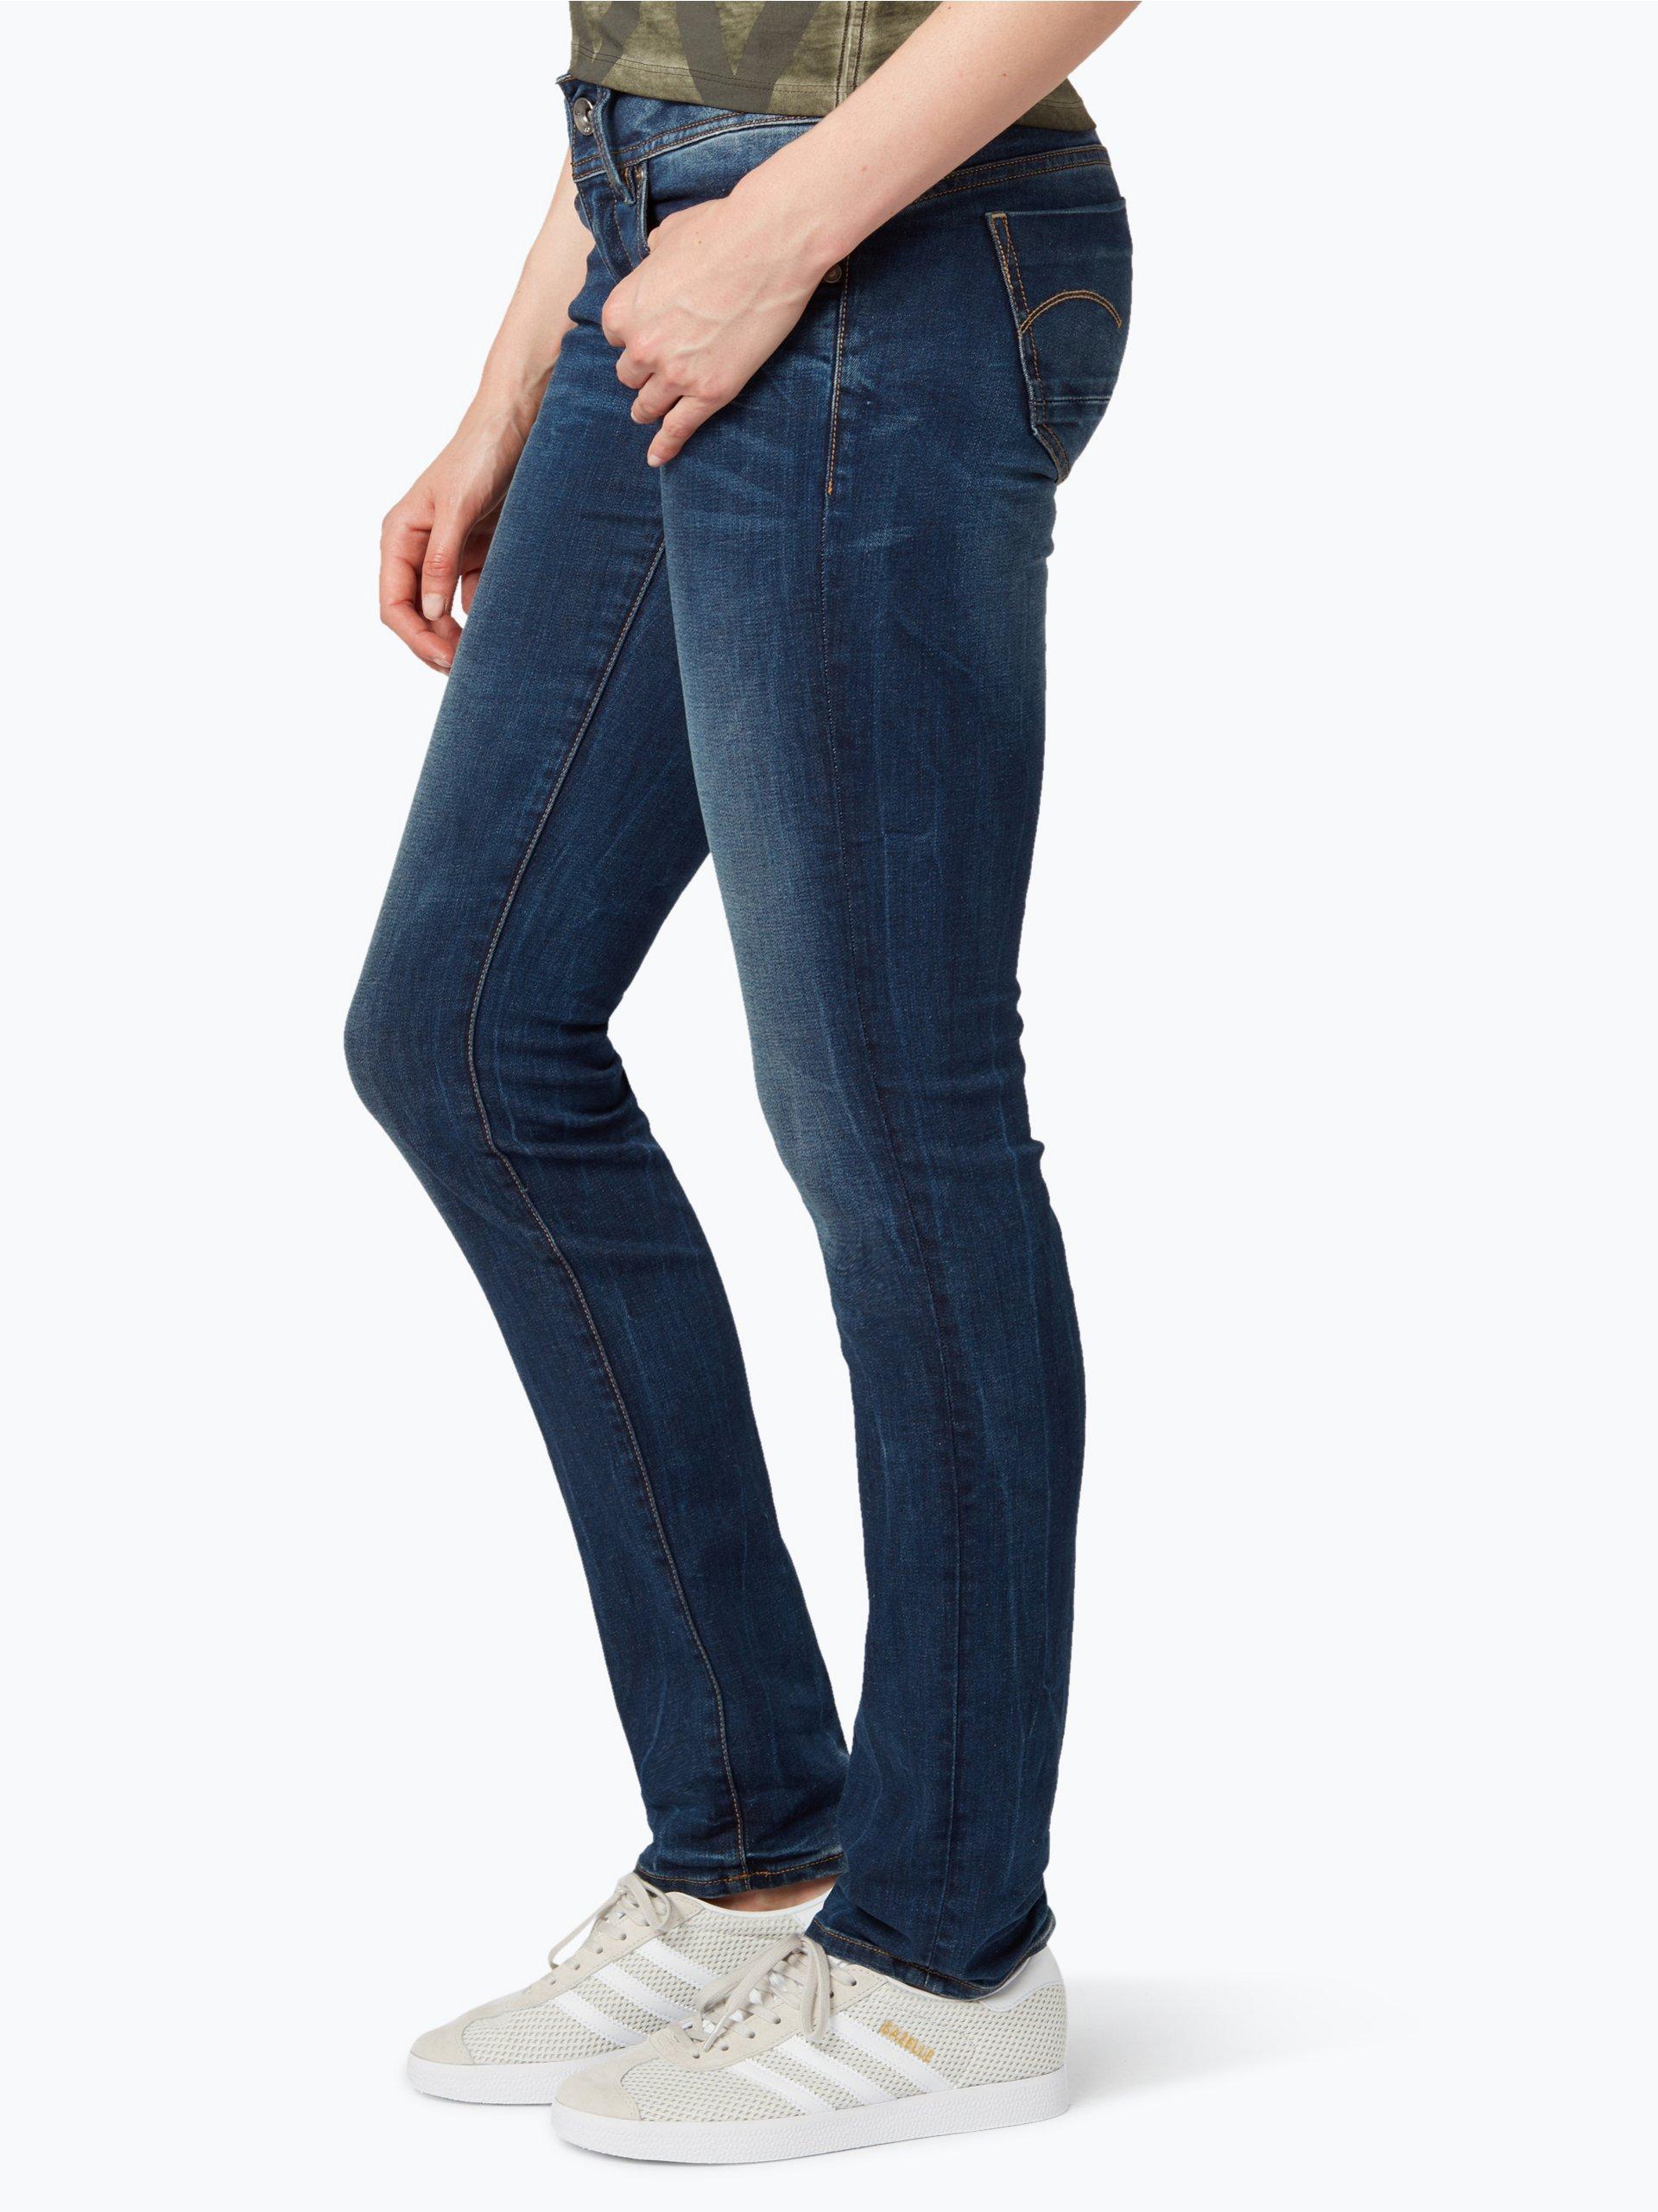 g star damen jeans midge mehrfarbig indigo uni online. Black Bedroom Furniture Sets. Home Design Ideas